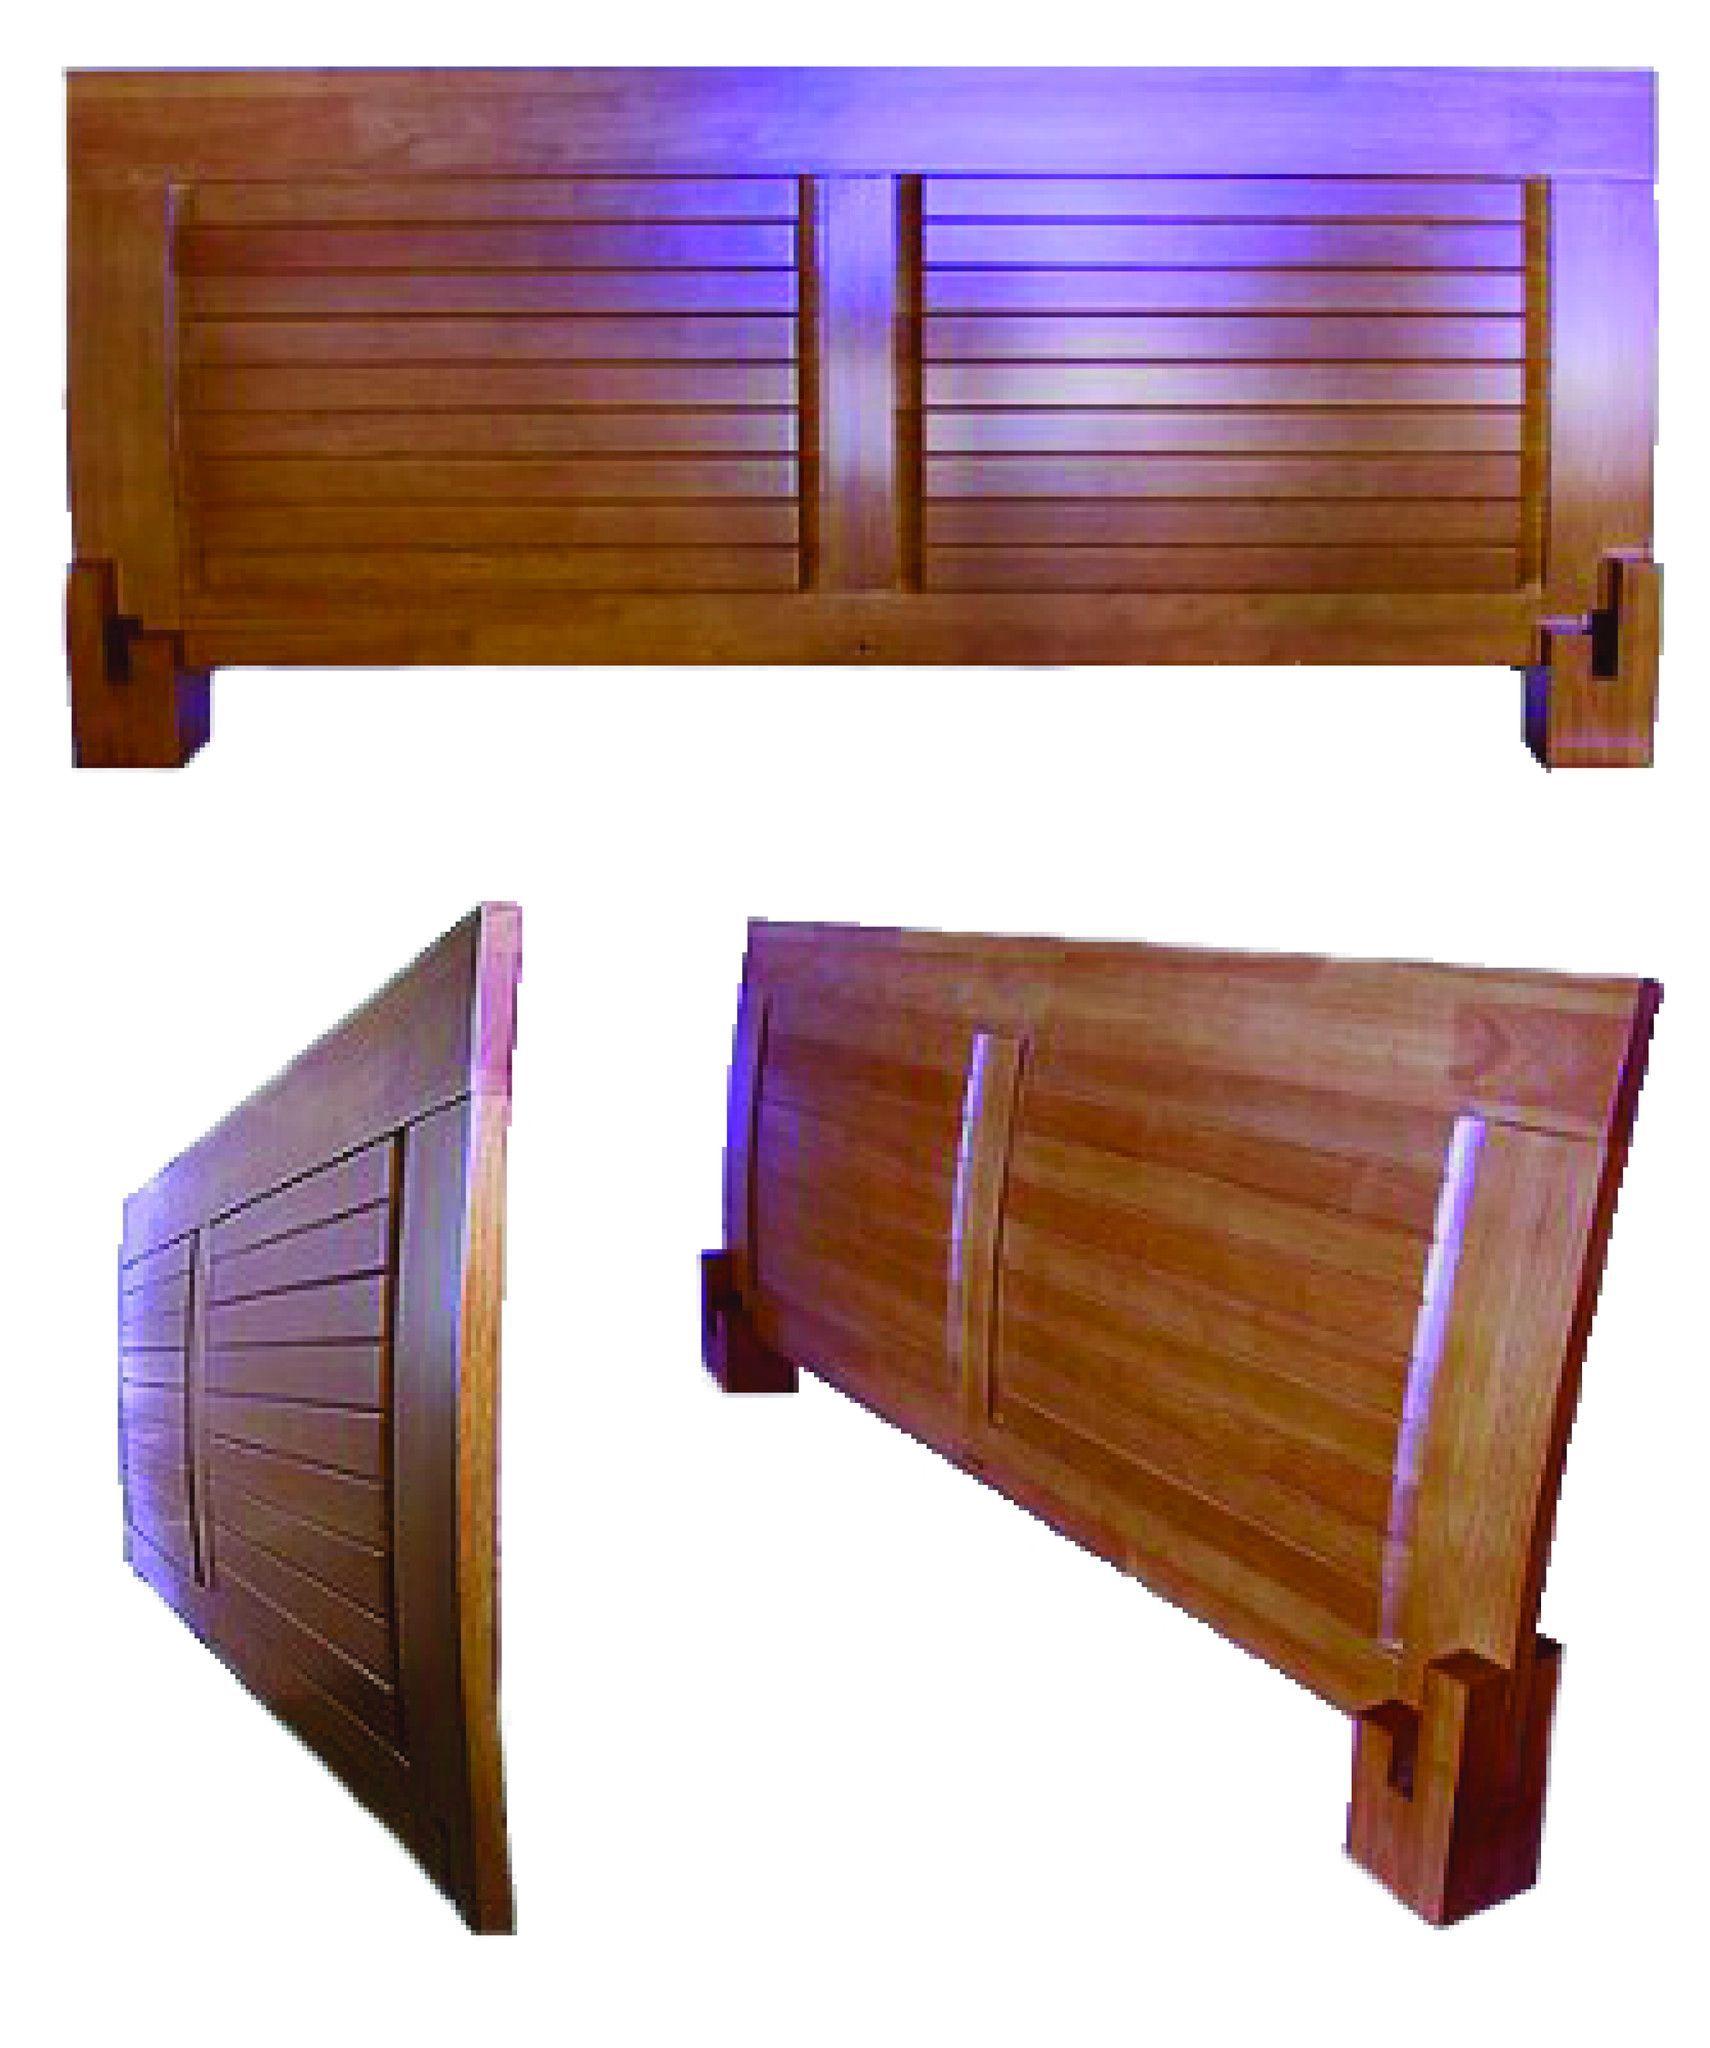 Tatami Frame Headboard Wood bed design, Solid wood bed